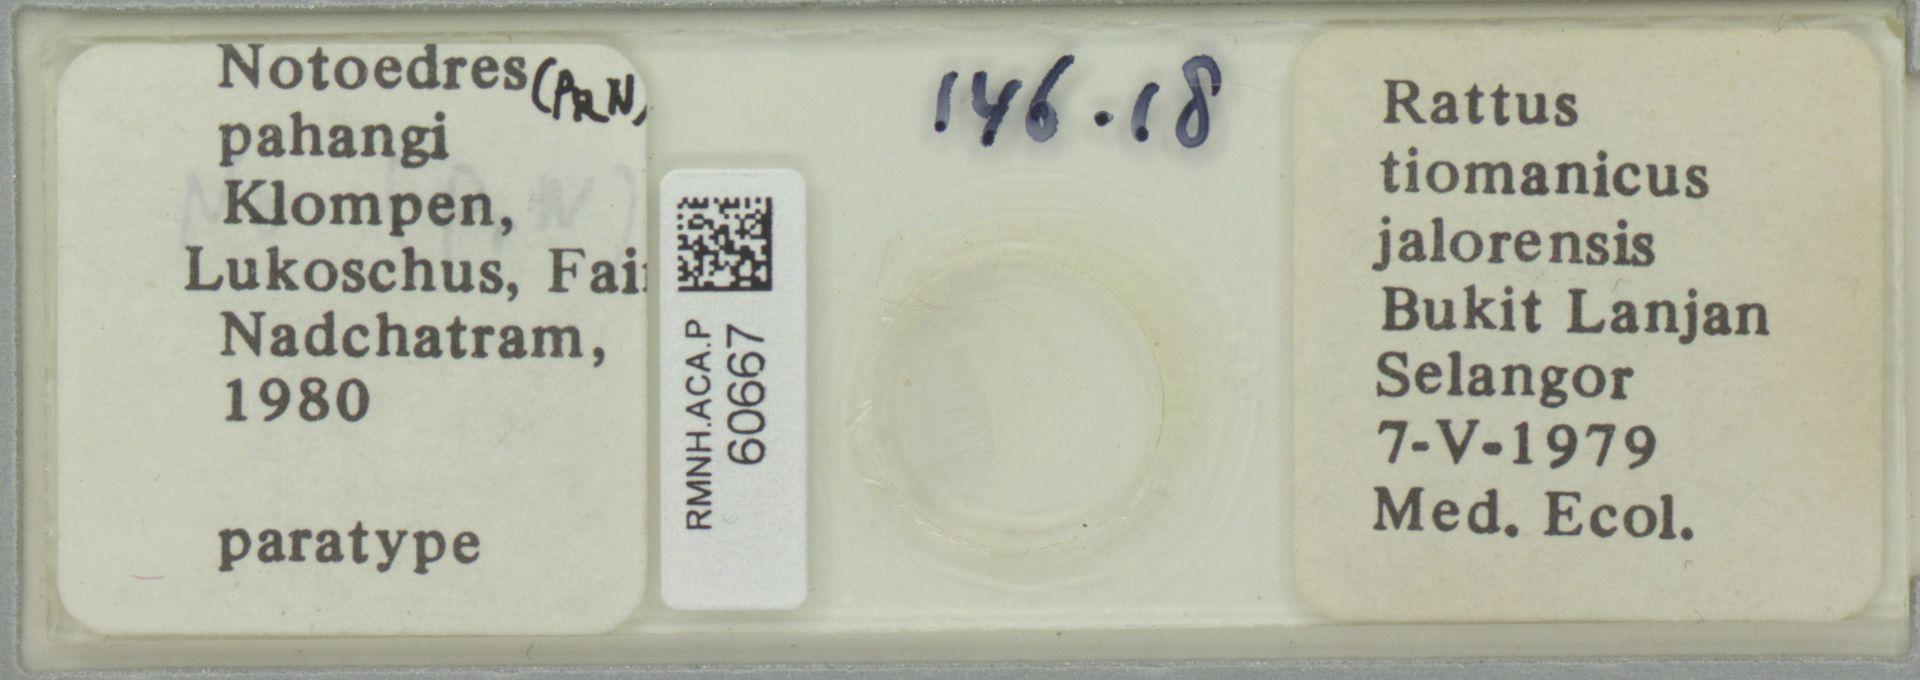 RMNH.ACA.P.60667 | Notoedres pahangi Klompen, Lukoschus, Fain & Nadchatram, 1980